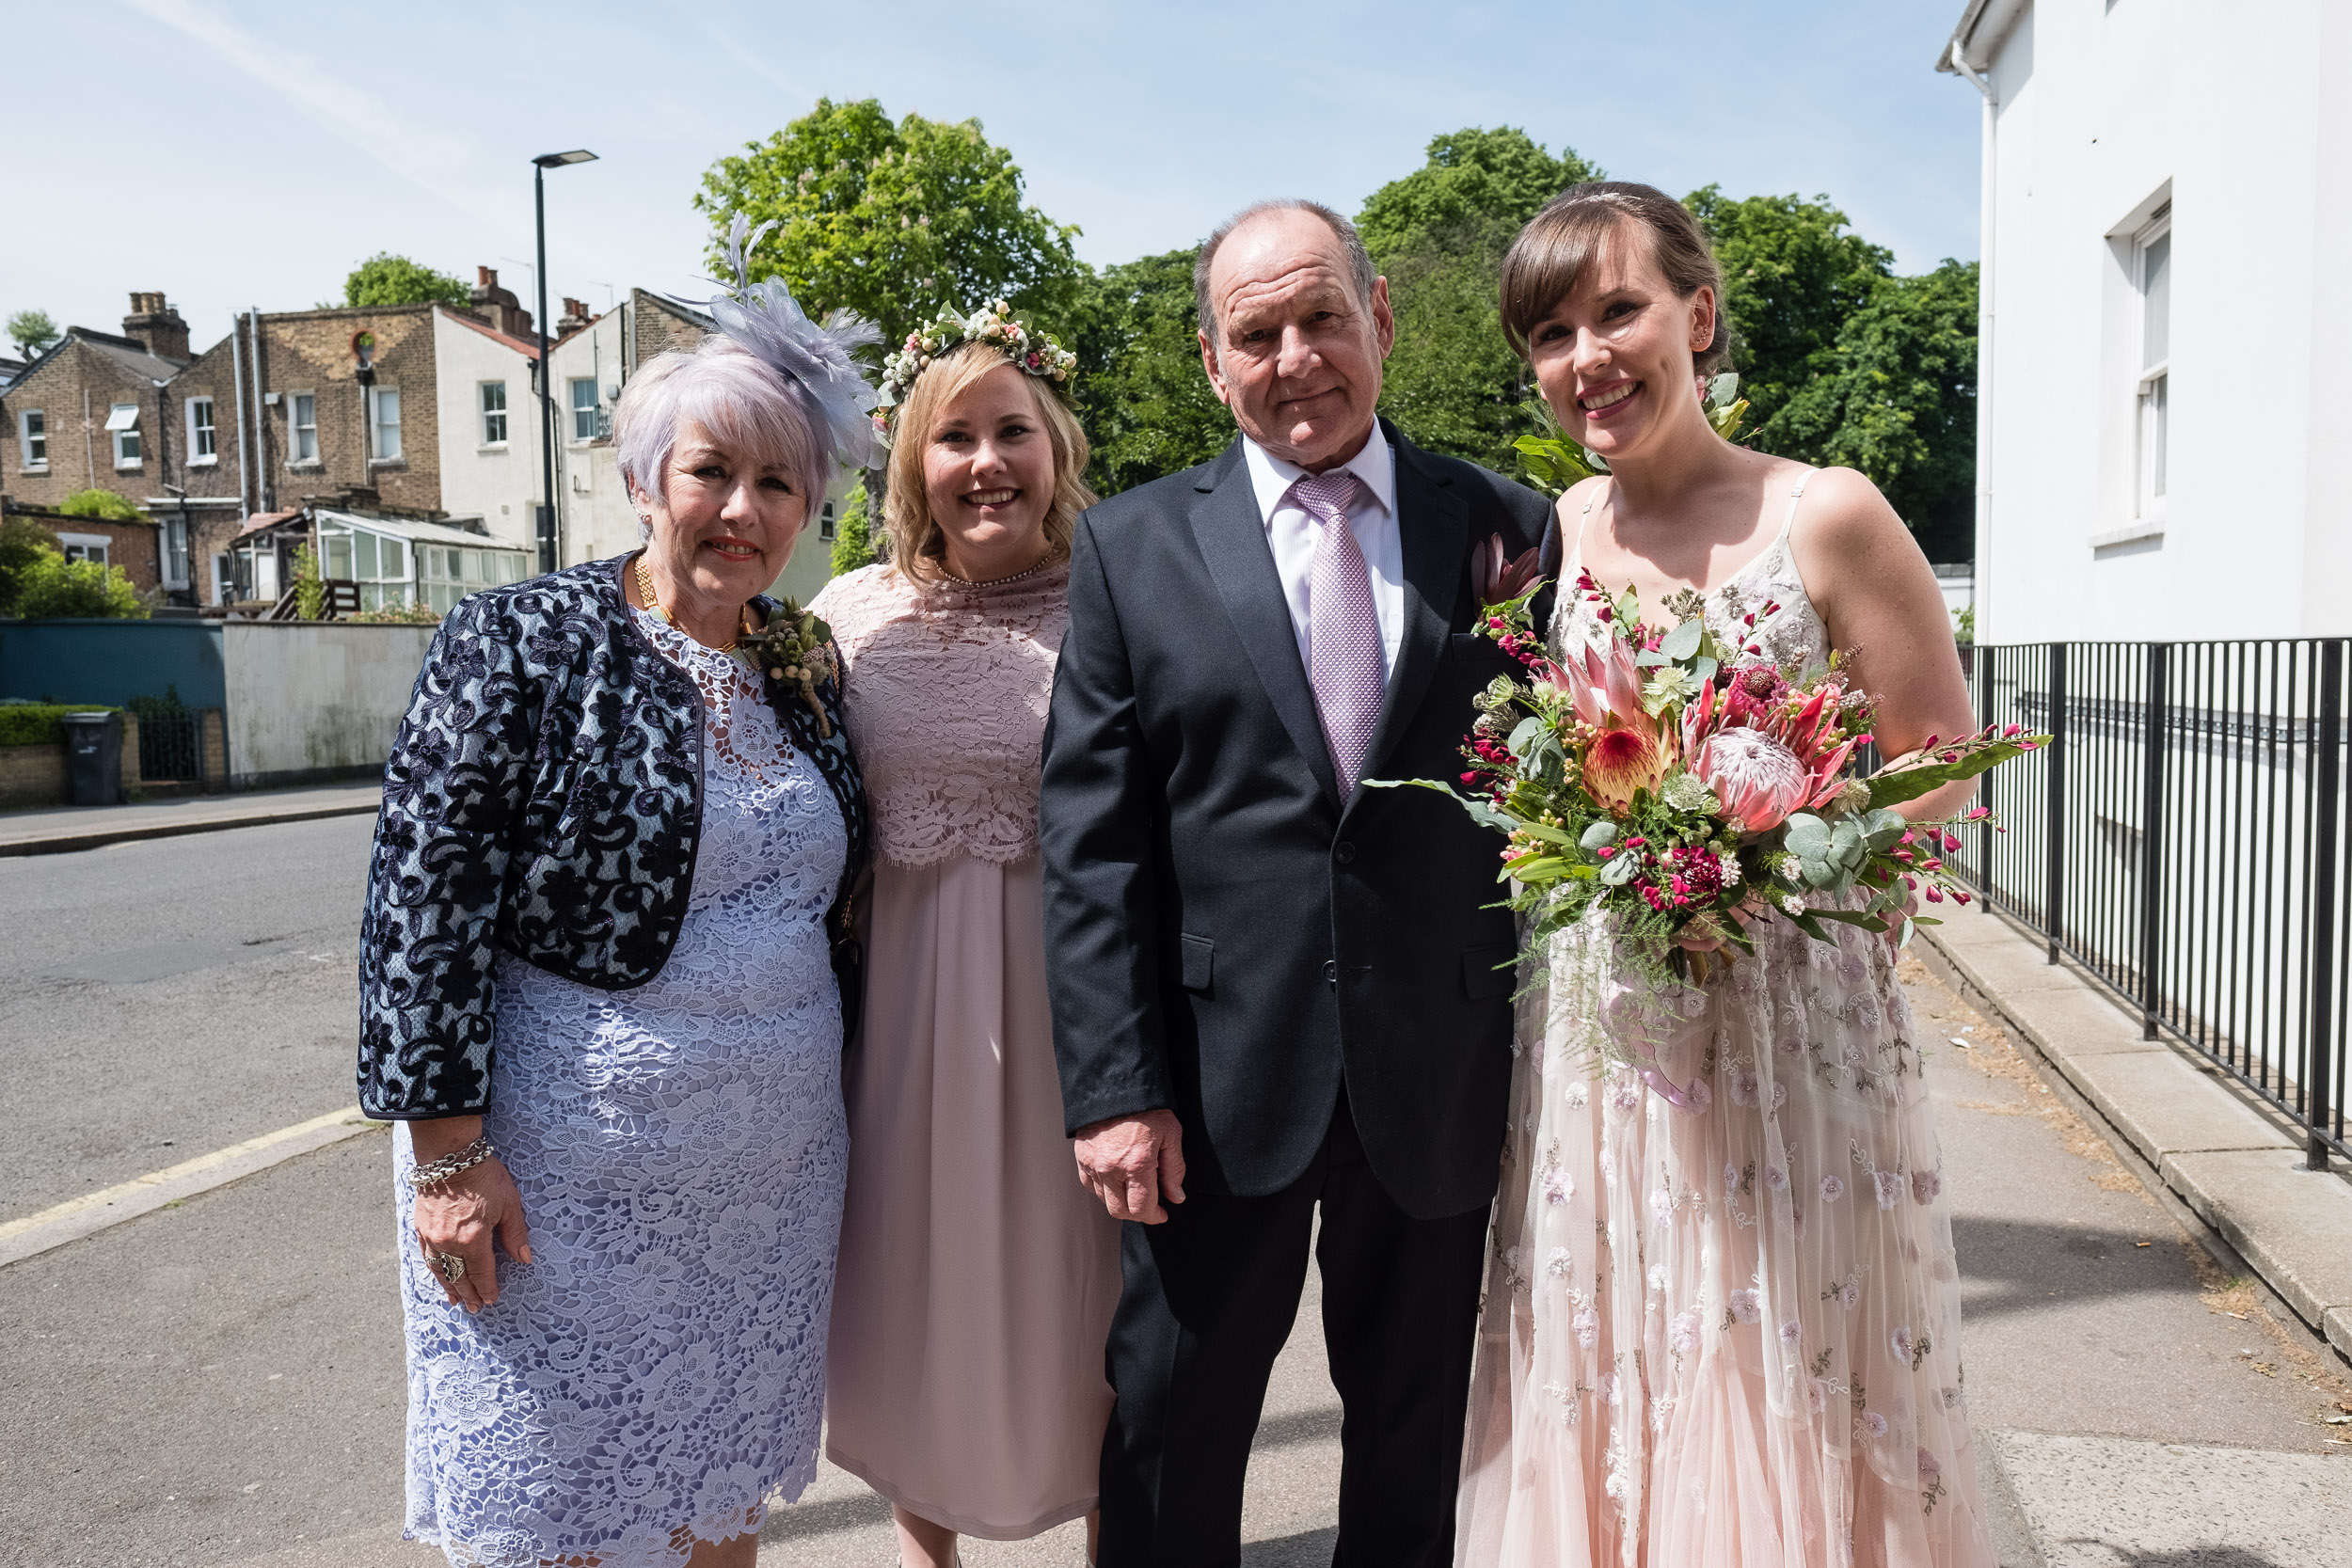 brockwell-lido-brixton-herne-hill-wedding-031.jpg